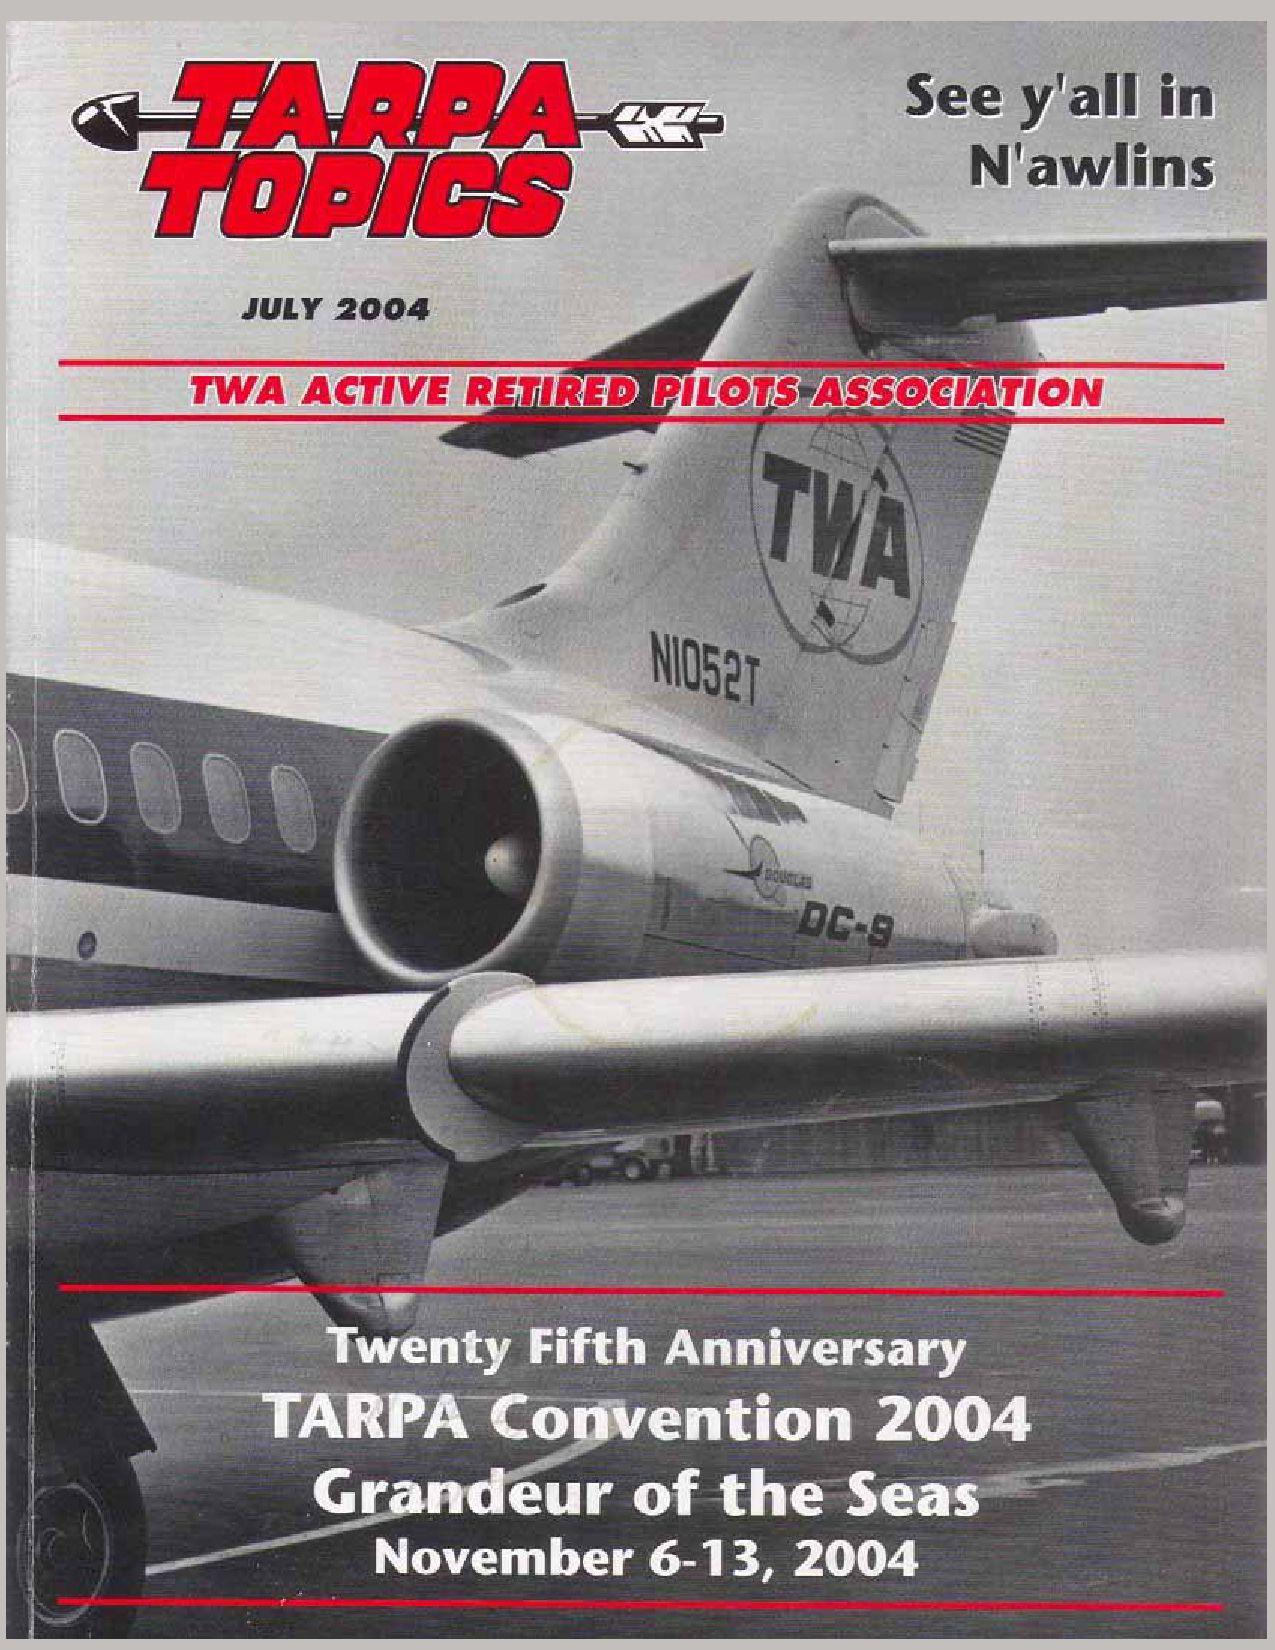 2004.07.TARPA_TOPICS by TWA Active Retired Pilots Assn. - issuu